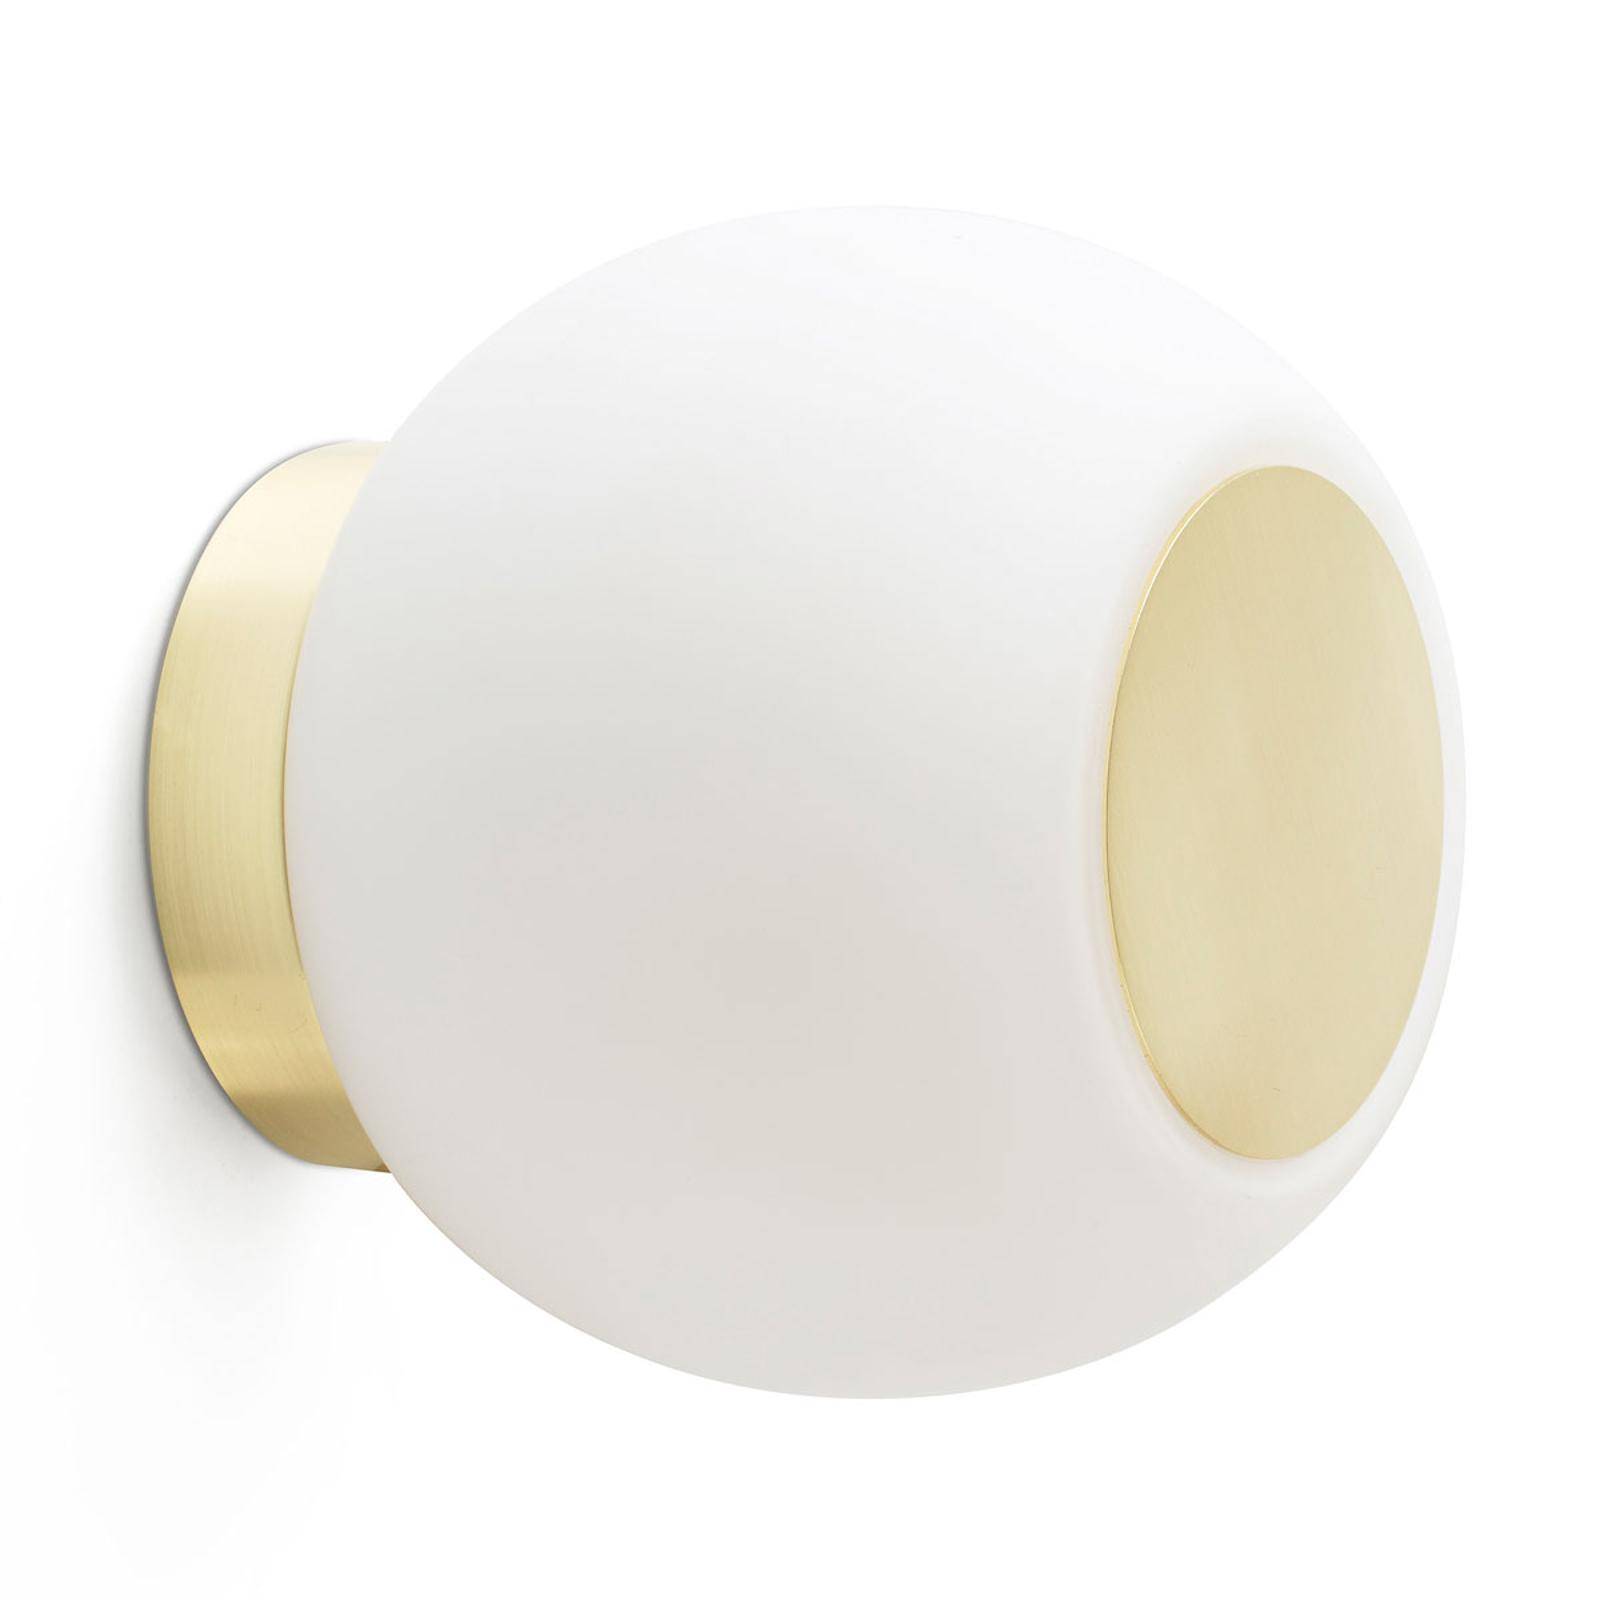 LED wandlamp Moy in goud met glazen kap